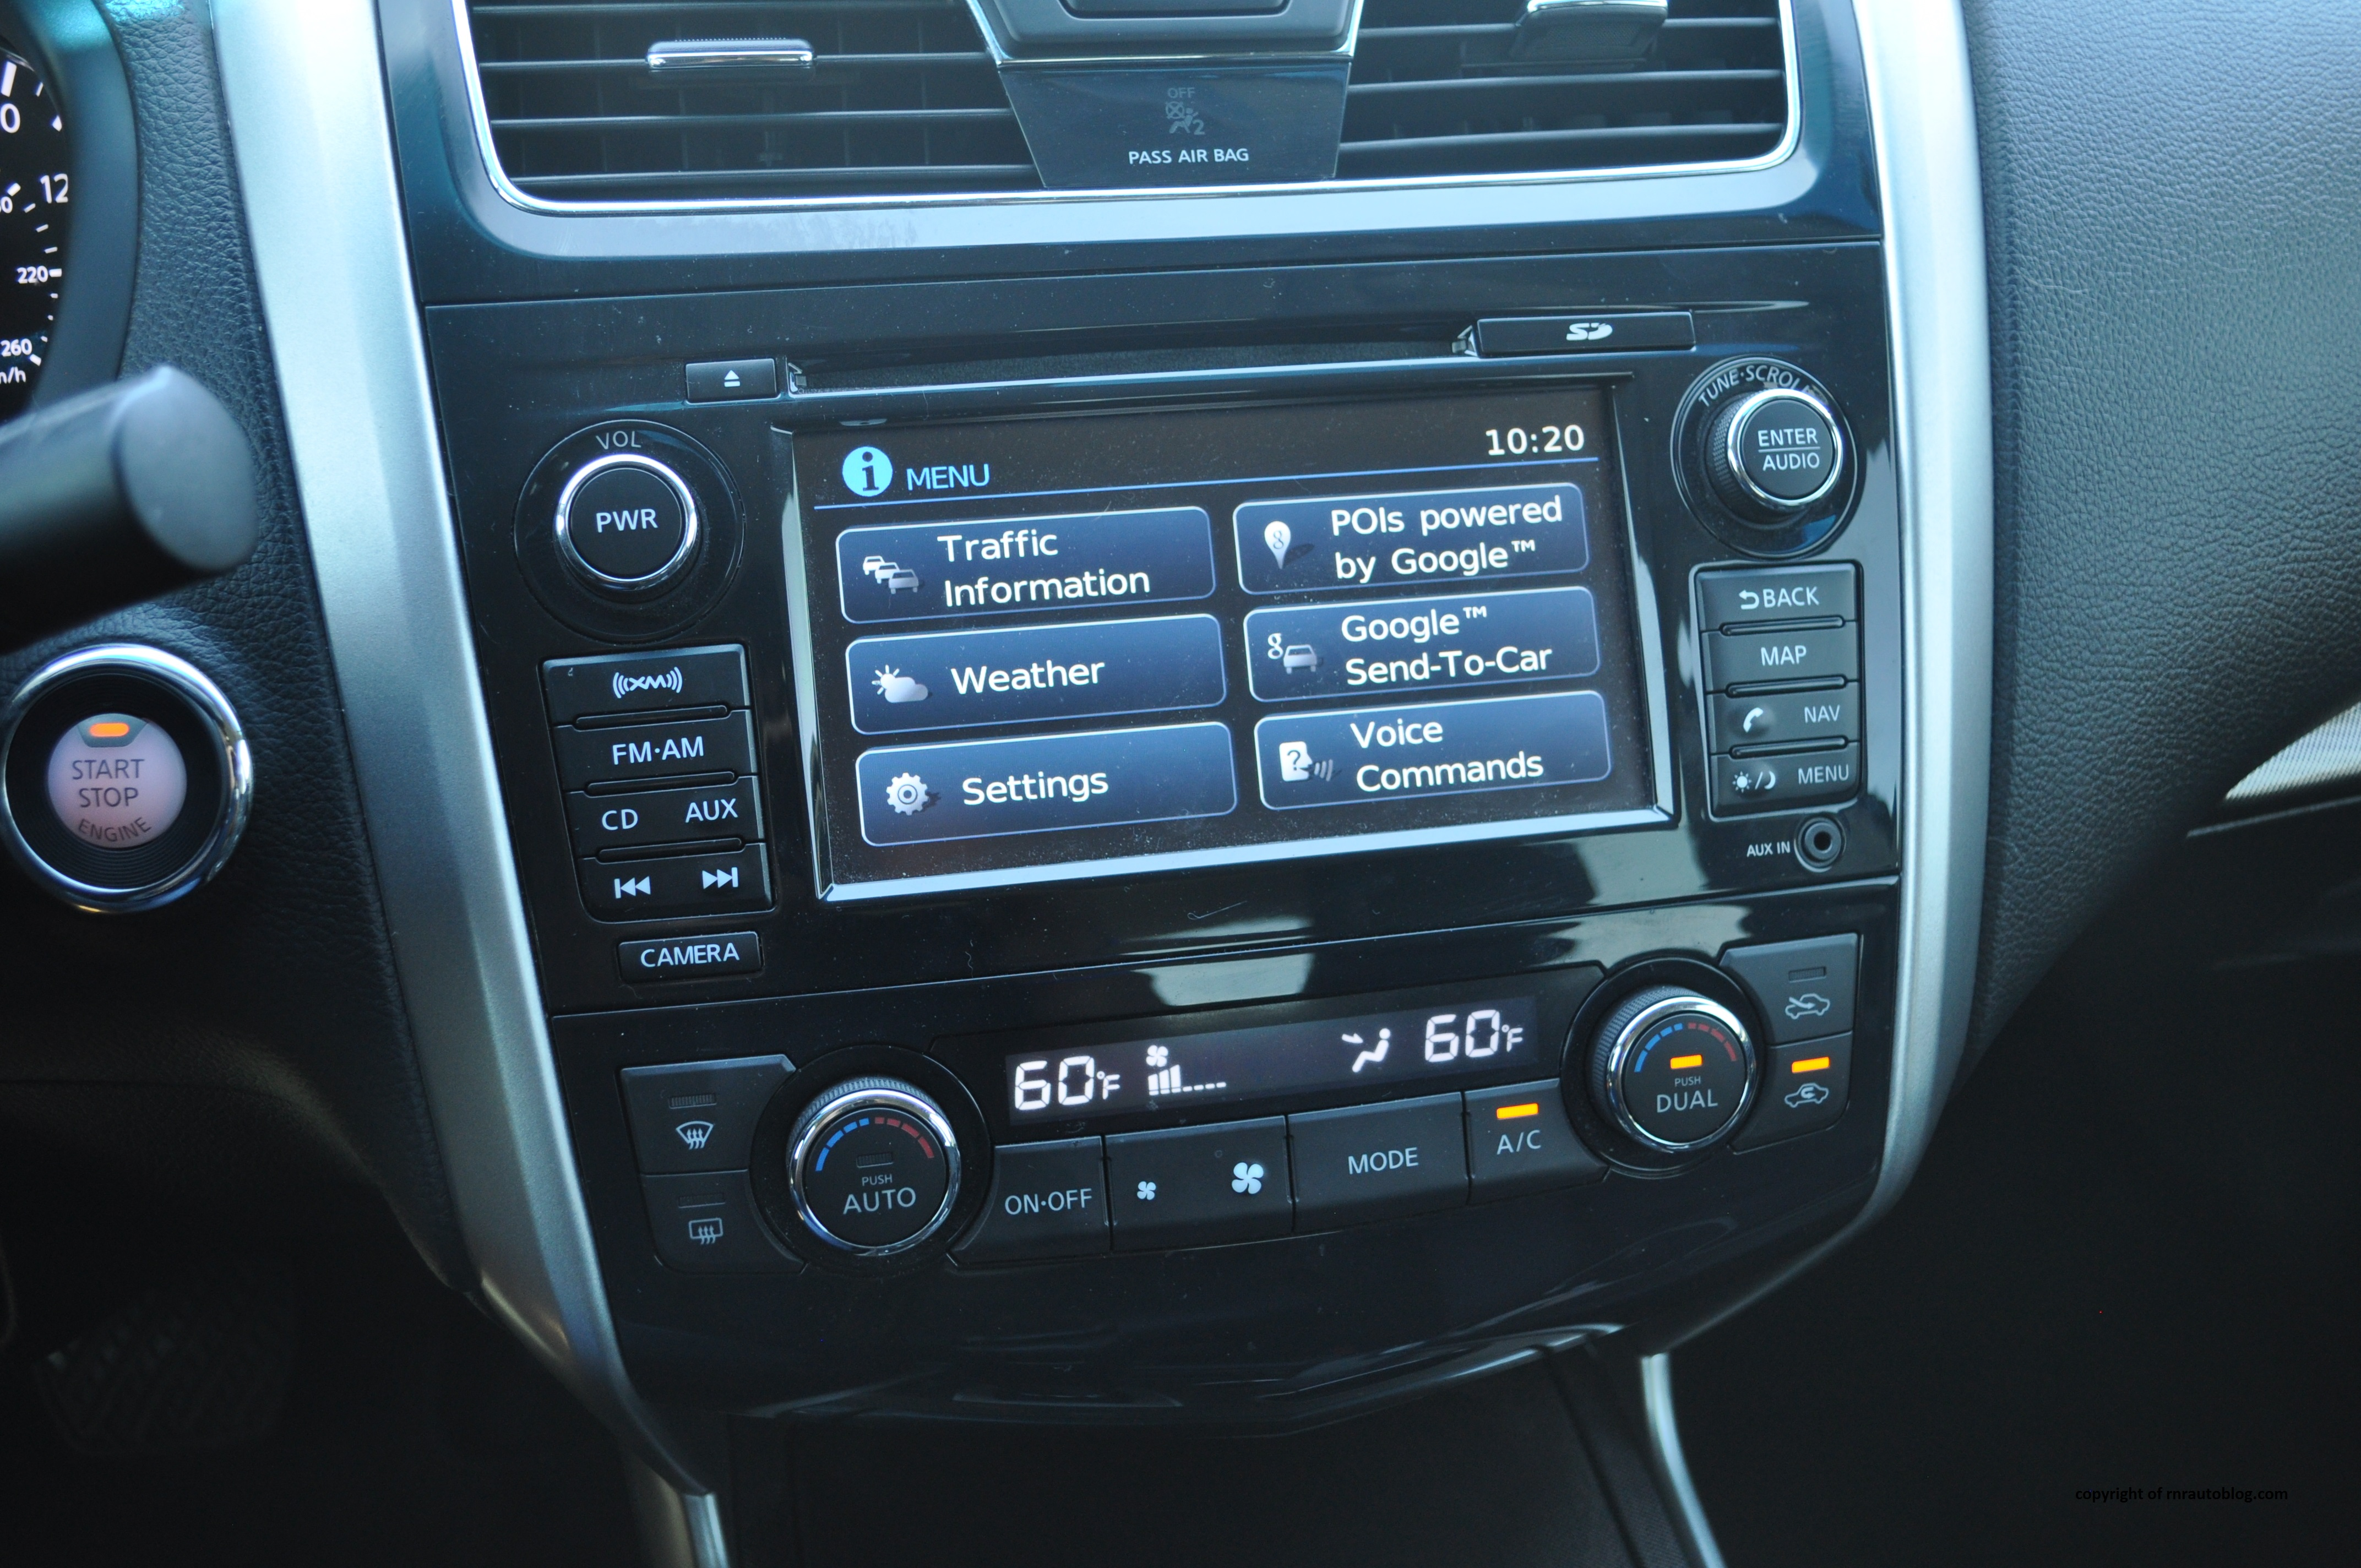 2013 nissan altima sl review rnr automotive blog rh rnrautoblog com Nissan In-Dash Navigation System Nissan In-Dash Navigation System